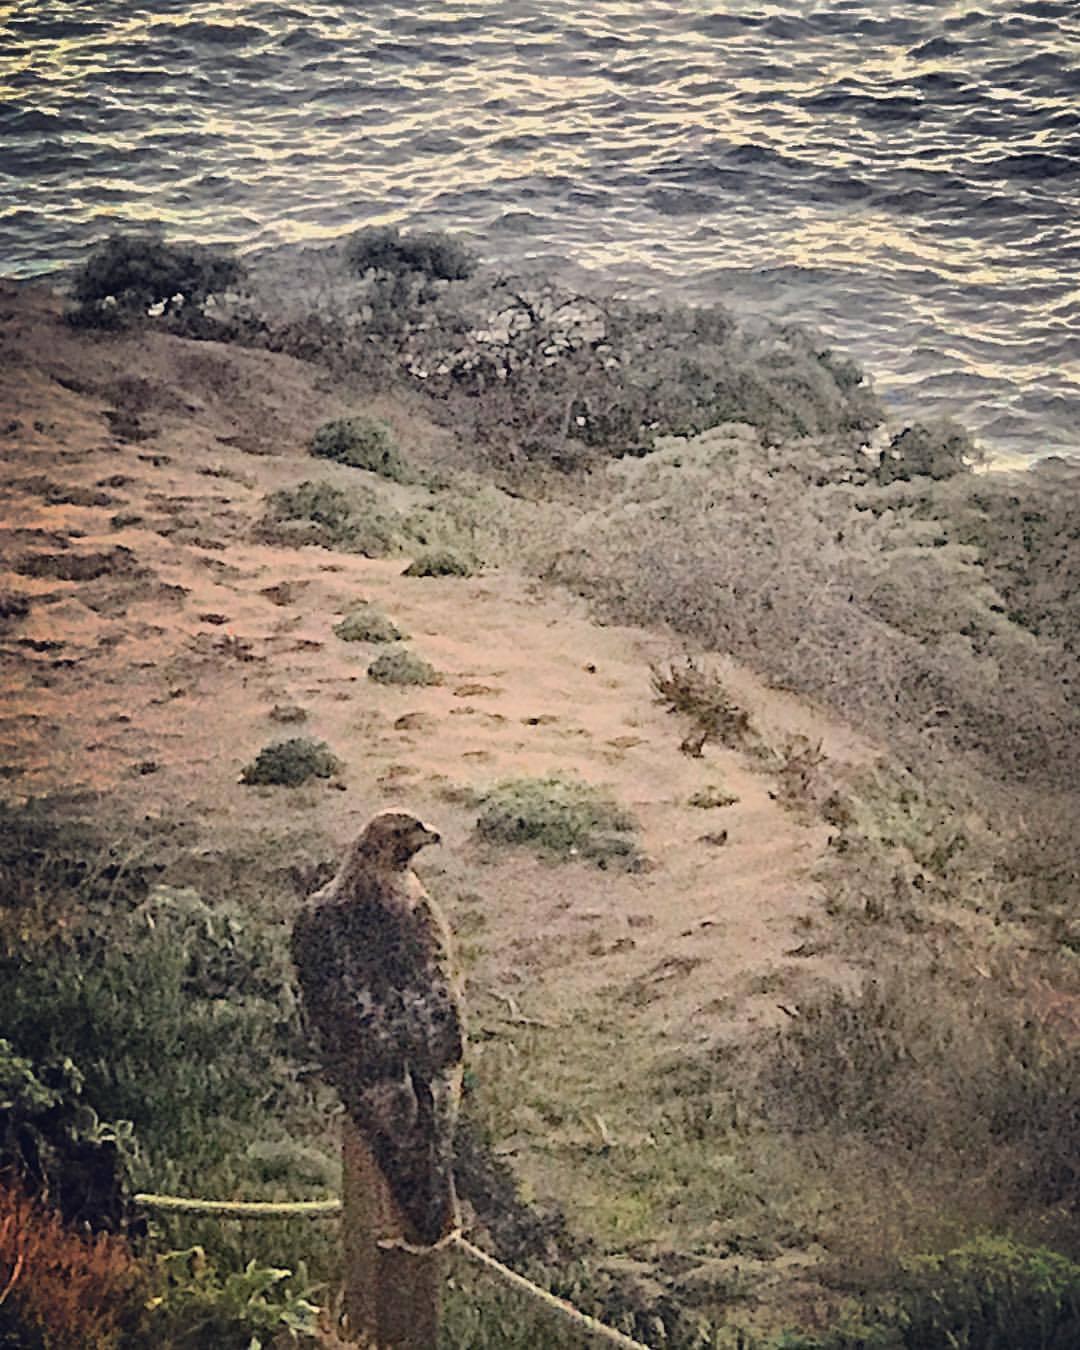 Fishing the coastline.  -  #california #ilovecalifornia #hawks #sonomacoast  (at Jenner, California)